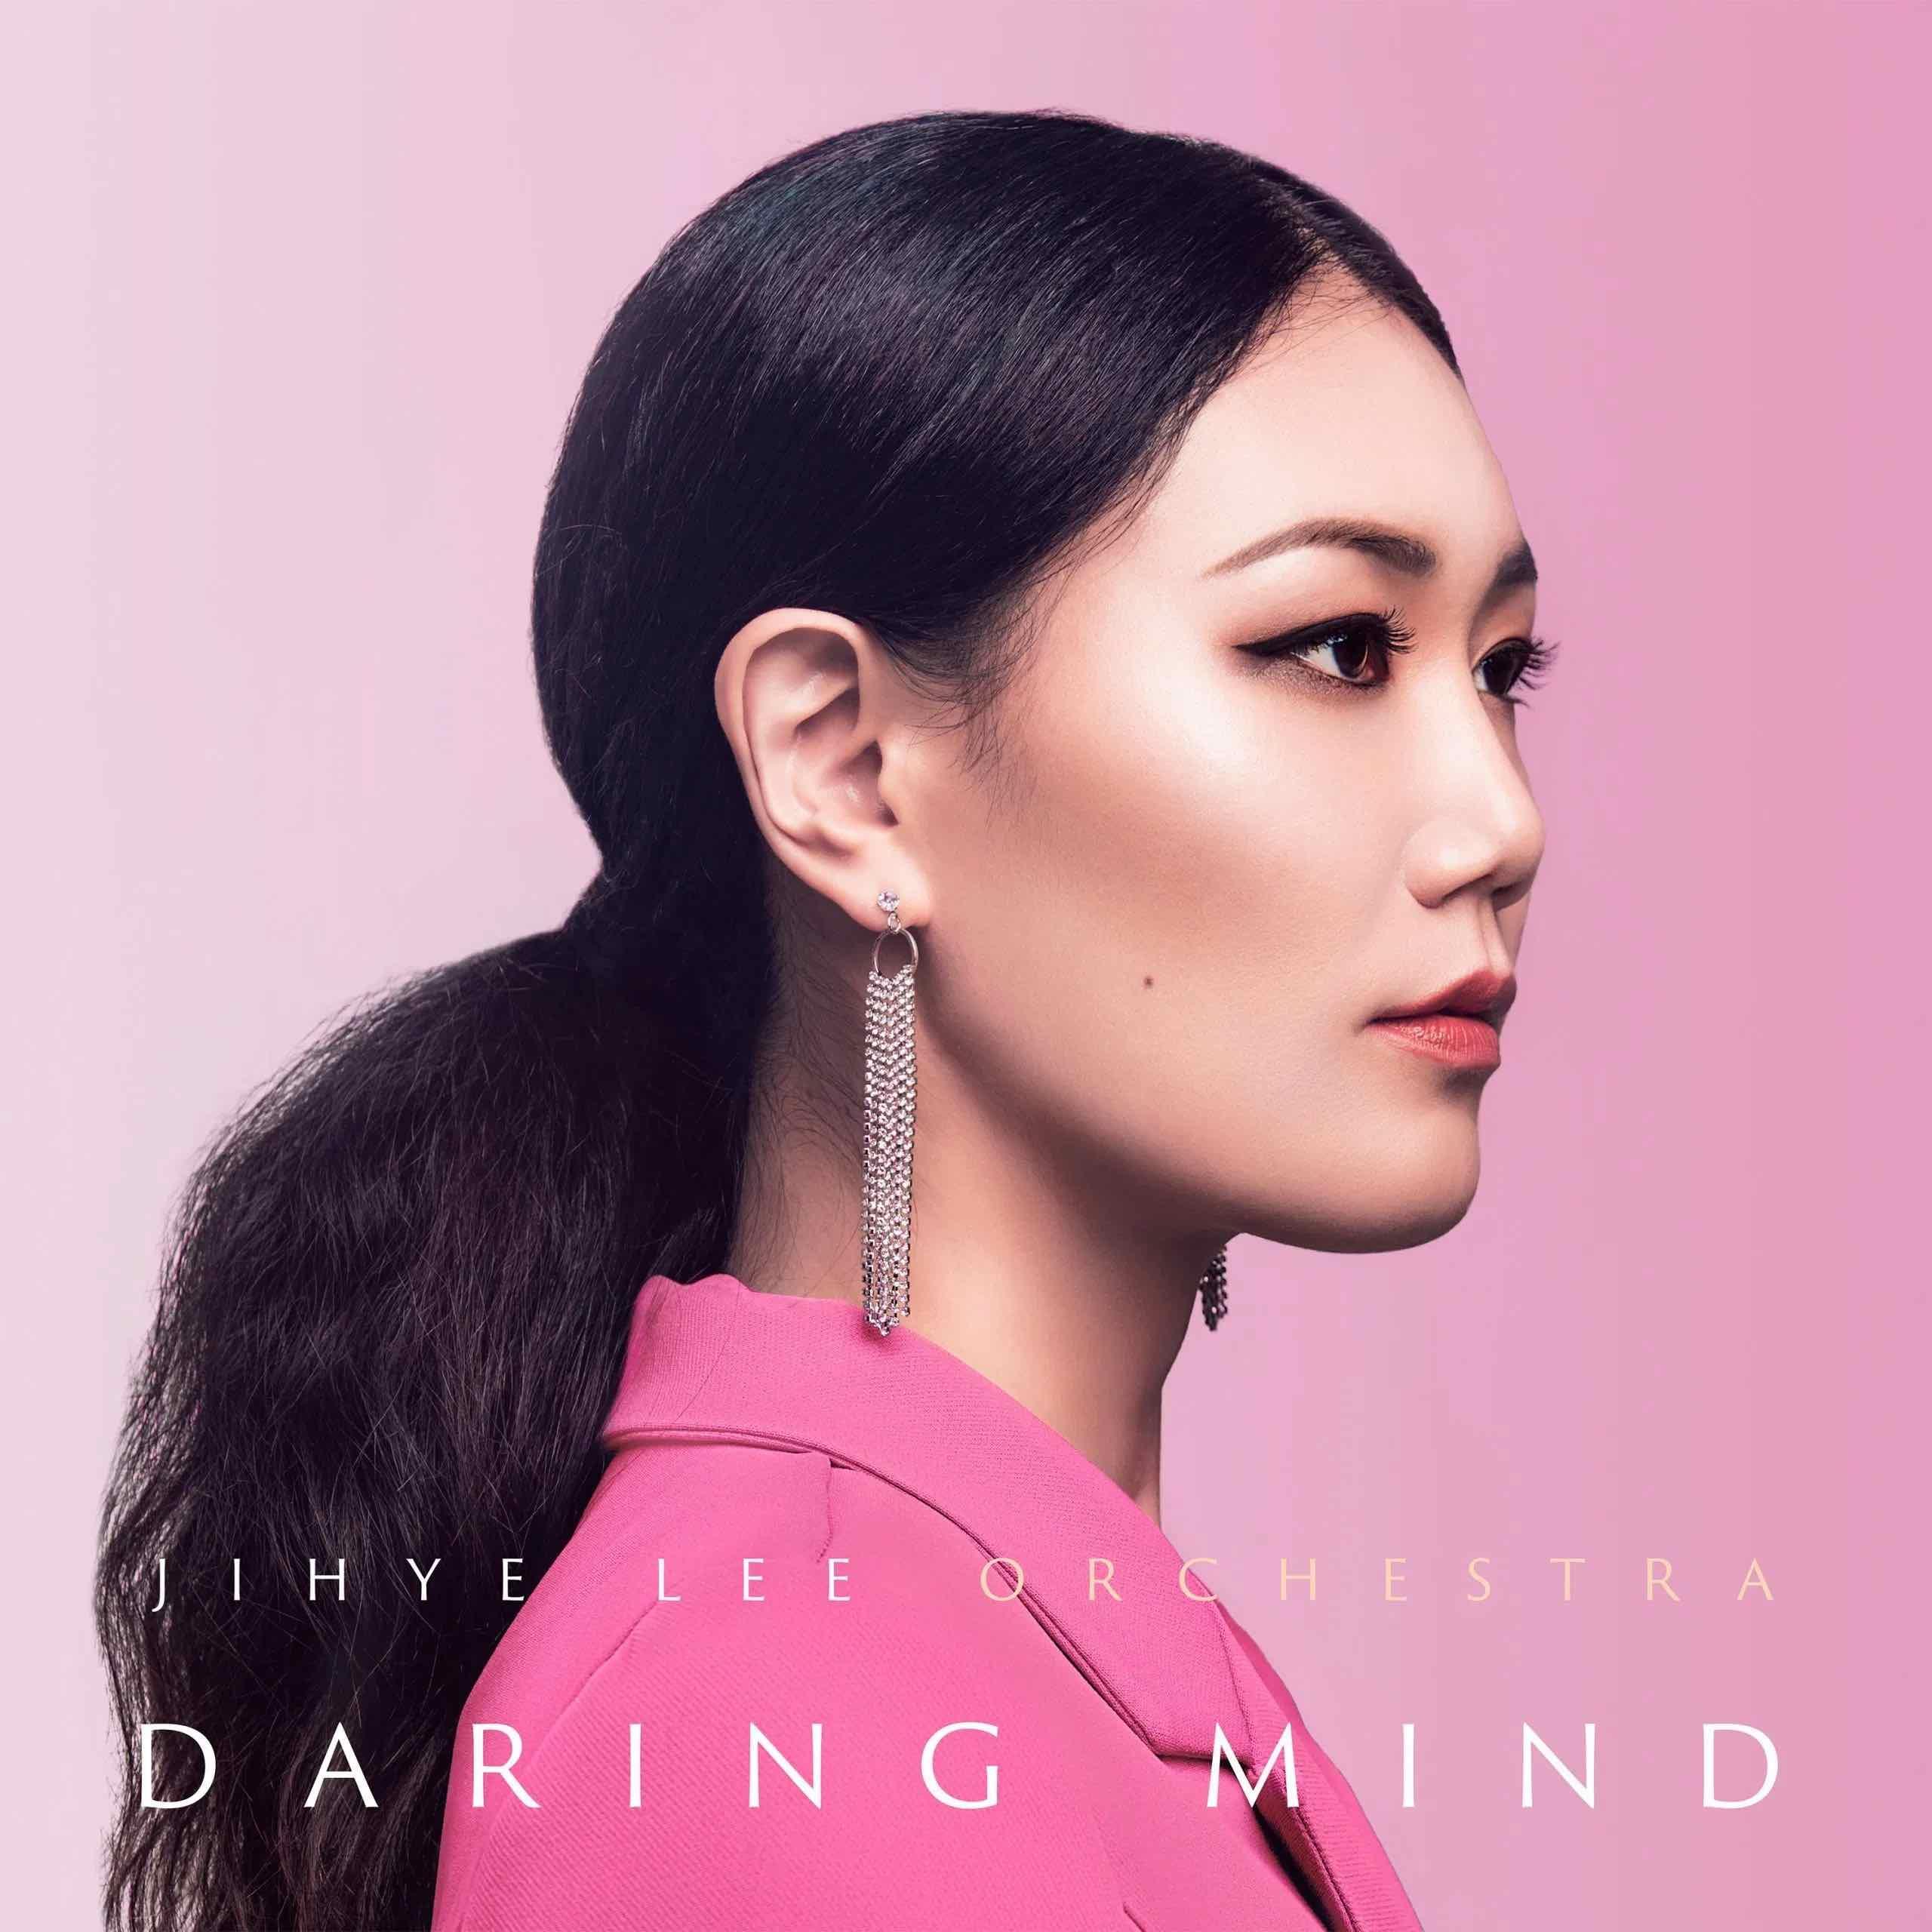 https://downbeat.com/images/reviews/Jihye_Lee_Orchestra%2C_Daring_Mind_%28Mote%CC%81ma%29.jpg